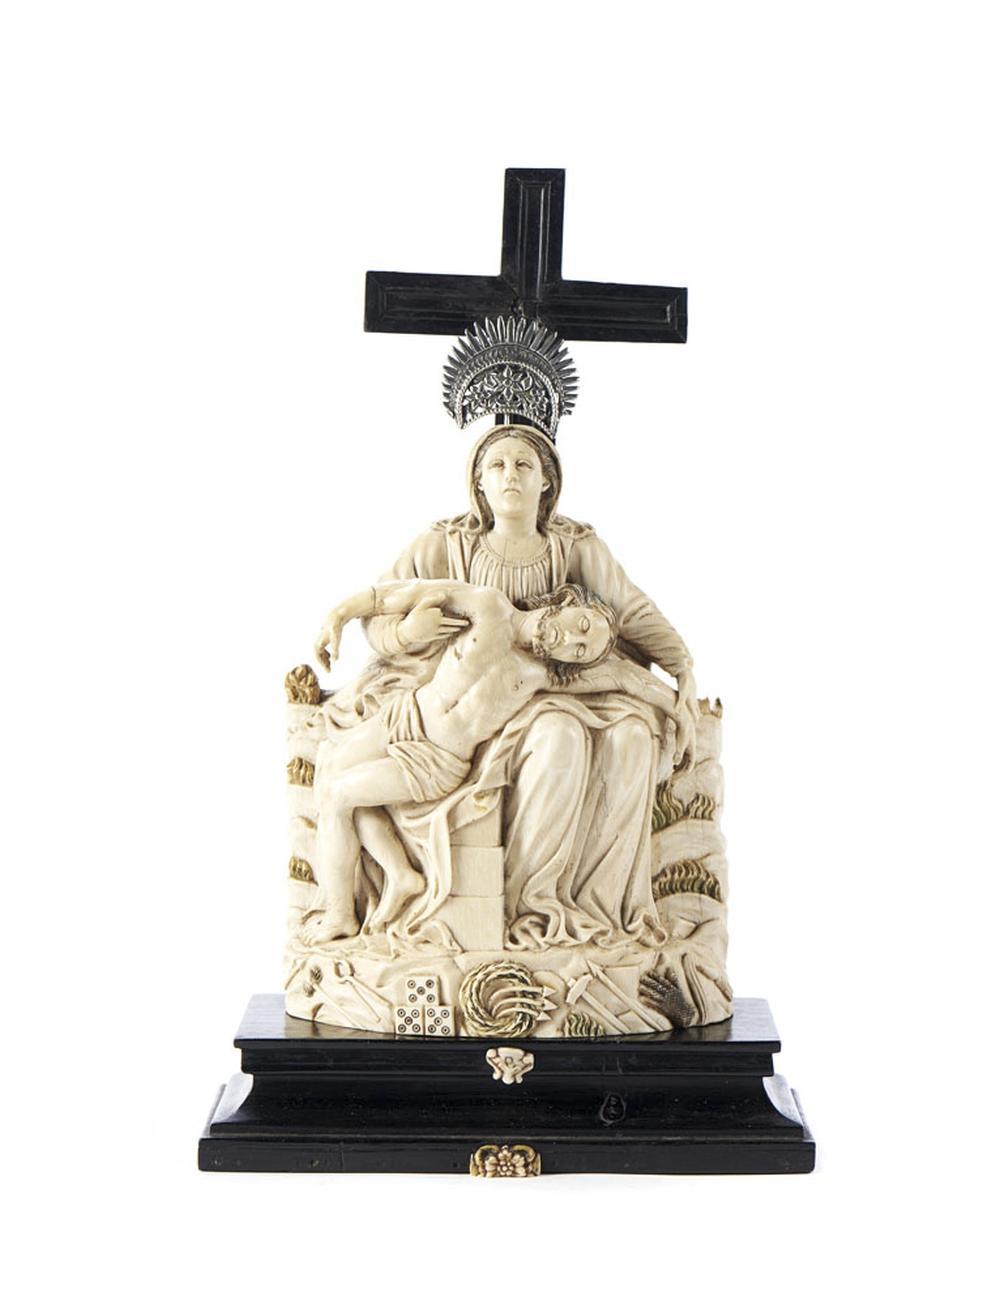 Pietá, escultura Indo-portuguesa do séc. XVII